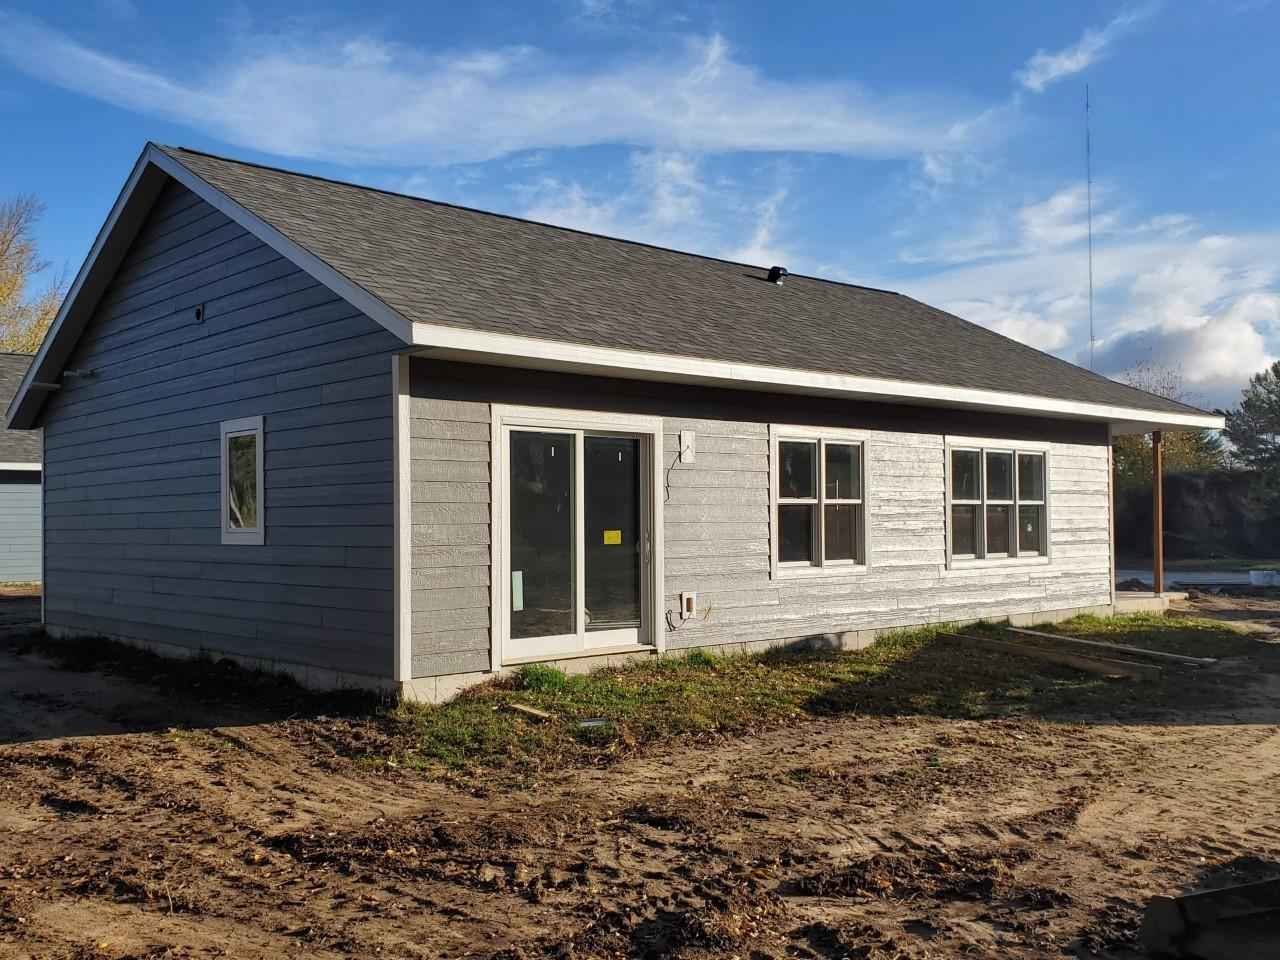 20157 Campus Ct, Galesville, Wisconsin 54630, 2 Bedrooms Bedrooms, 5 Rooms Rooms,2 BathroomsBathrooms,Single-family,For Sale,Campus Ct,1715128